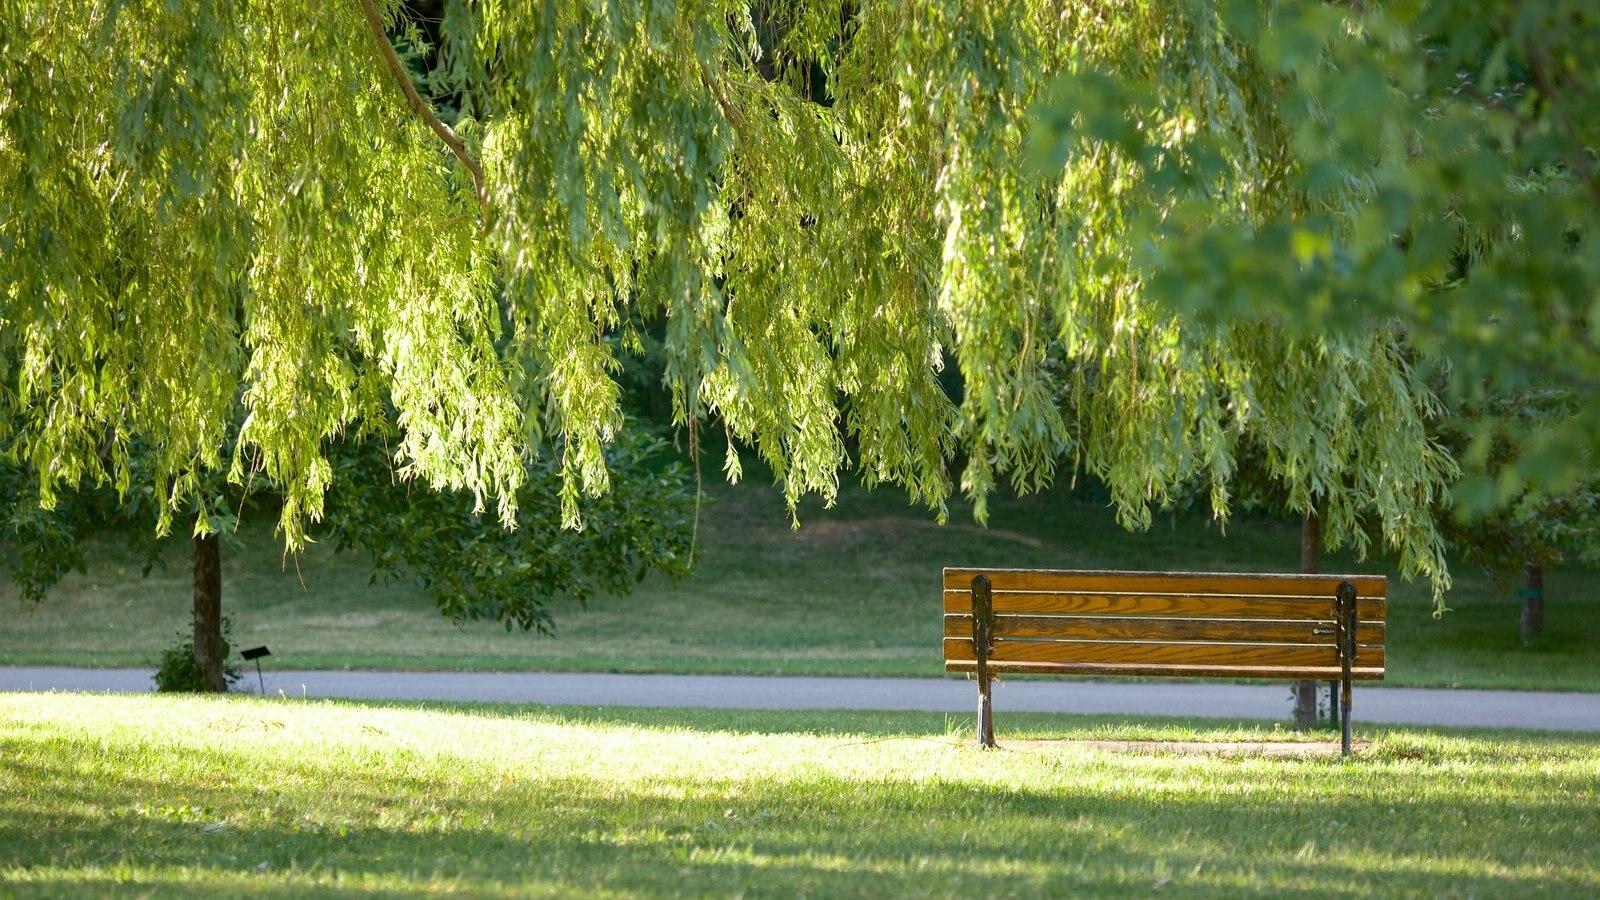 Collingwood caracterizando um jardim